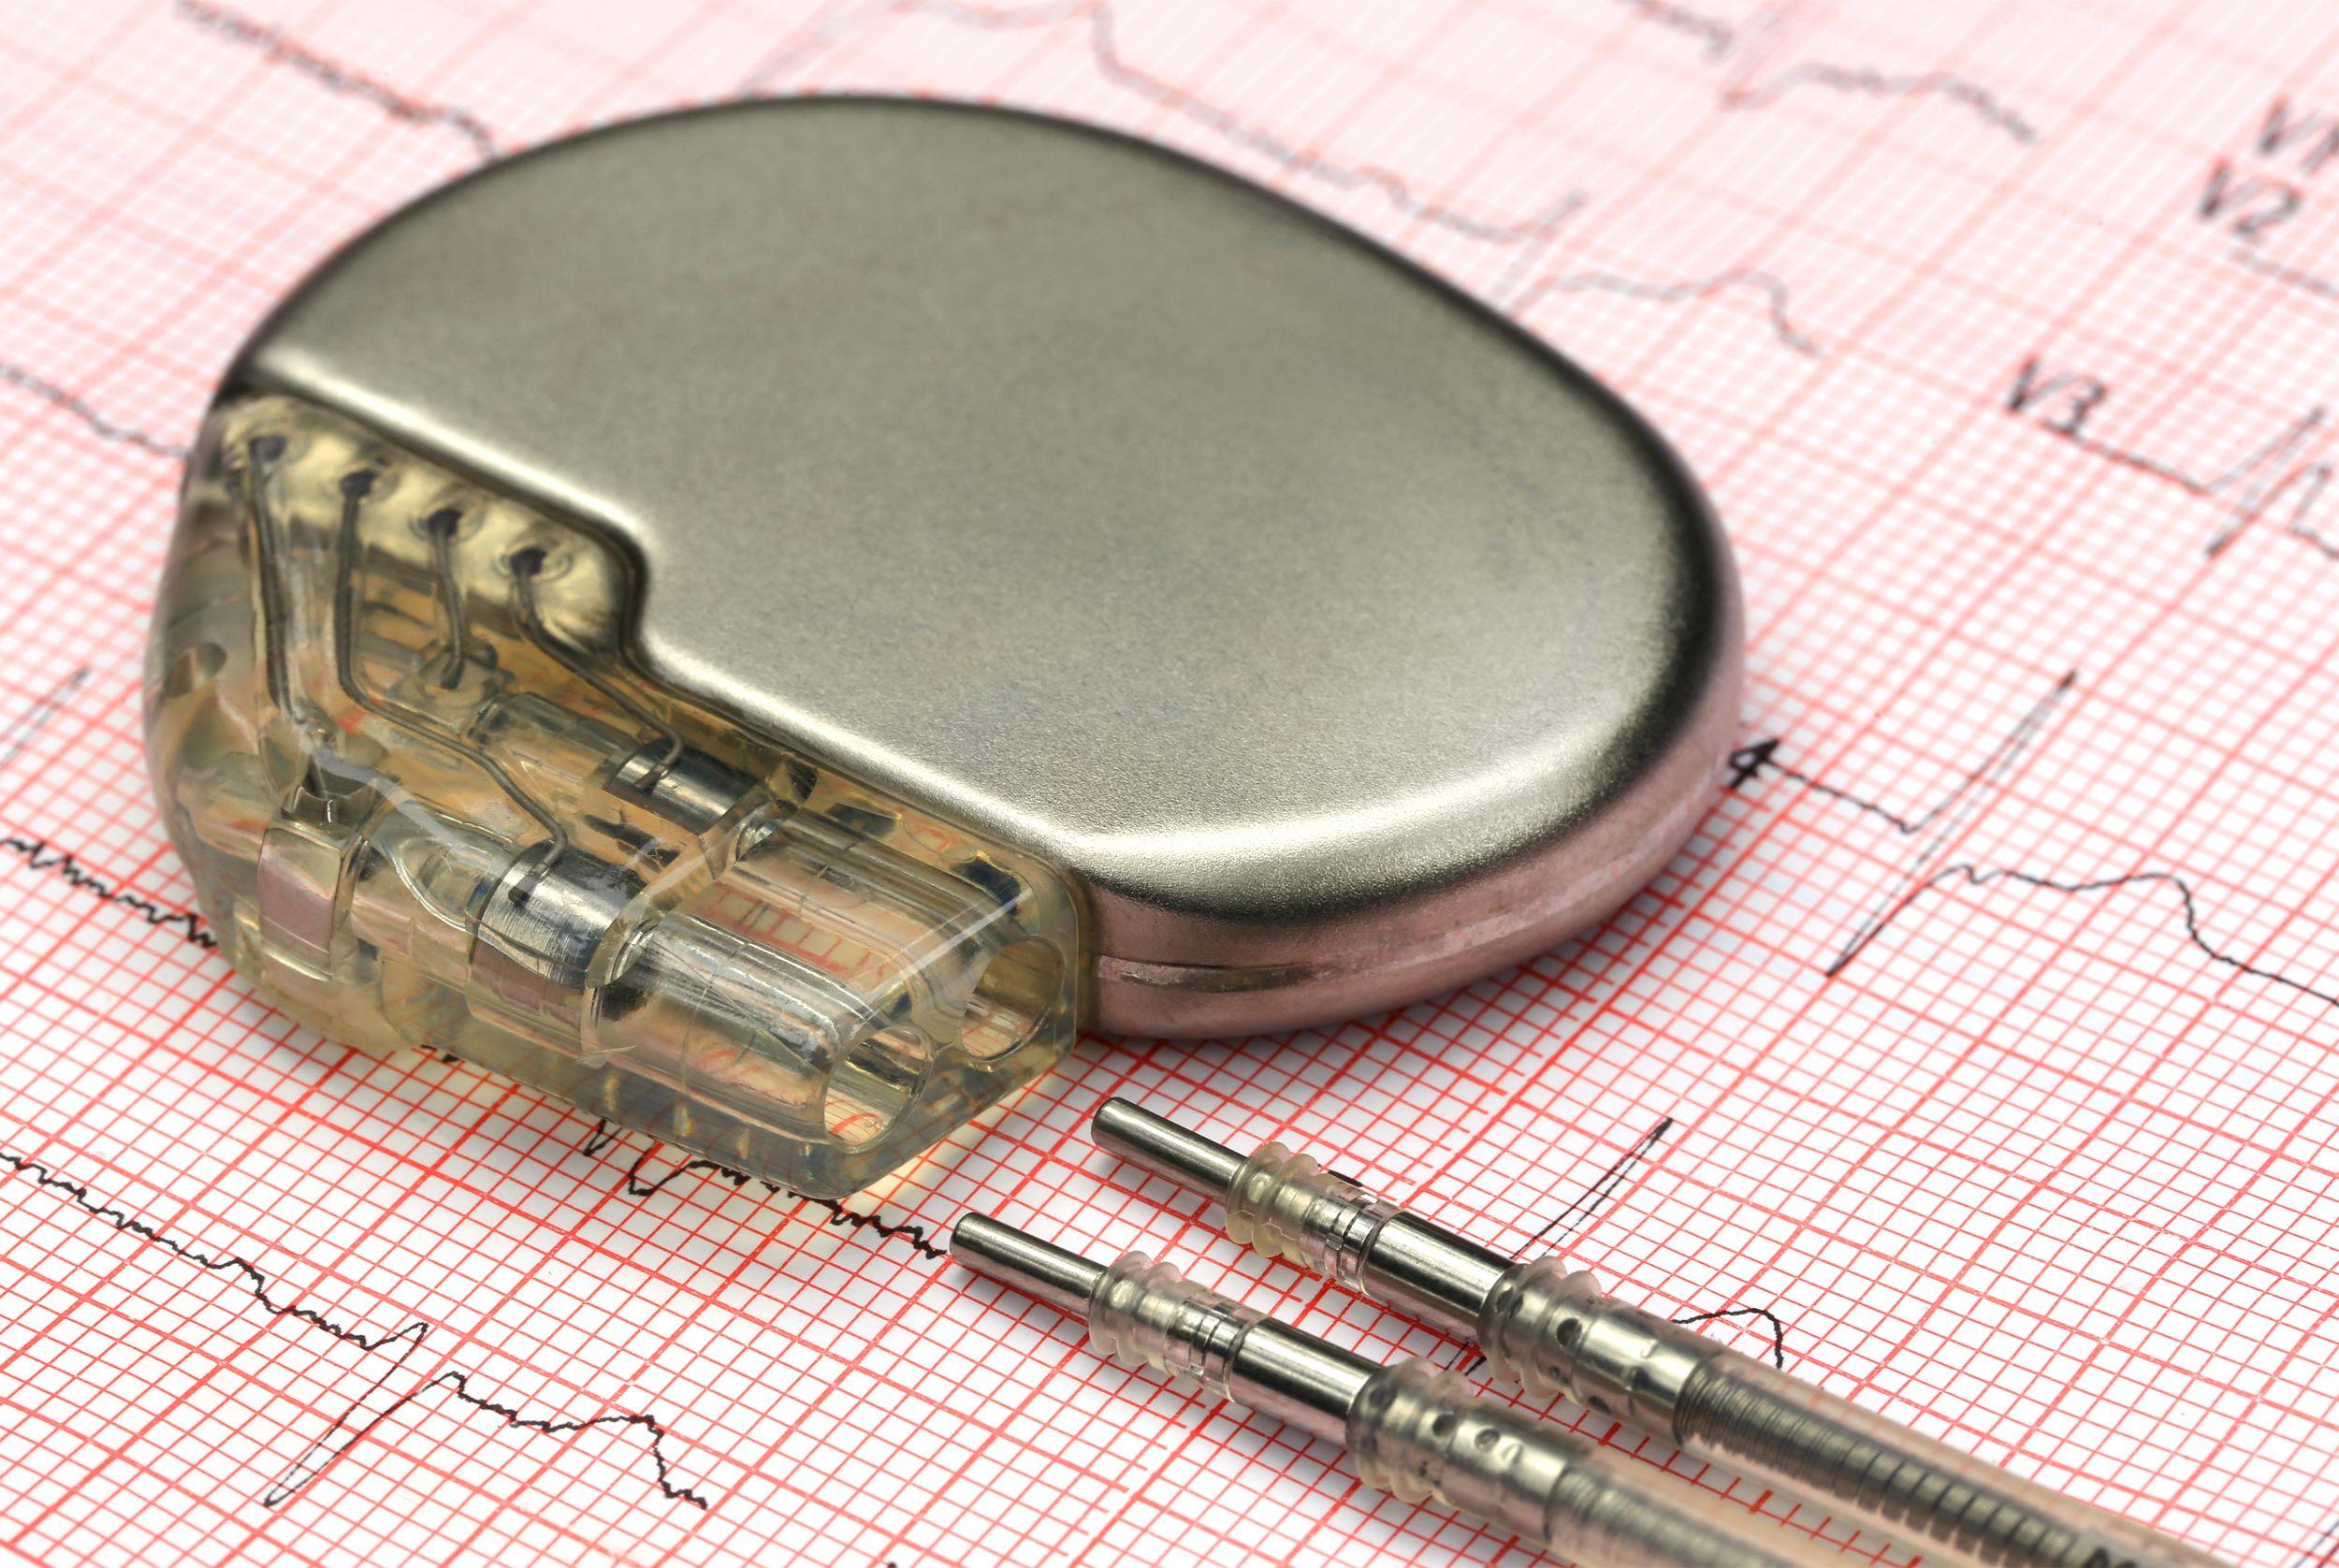 A pacemaker